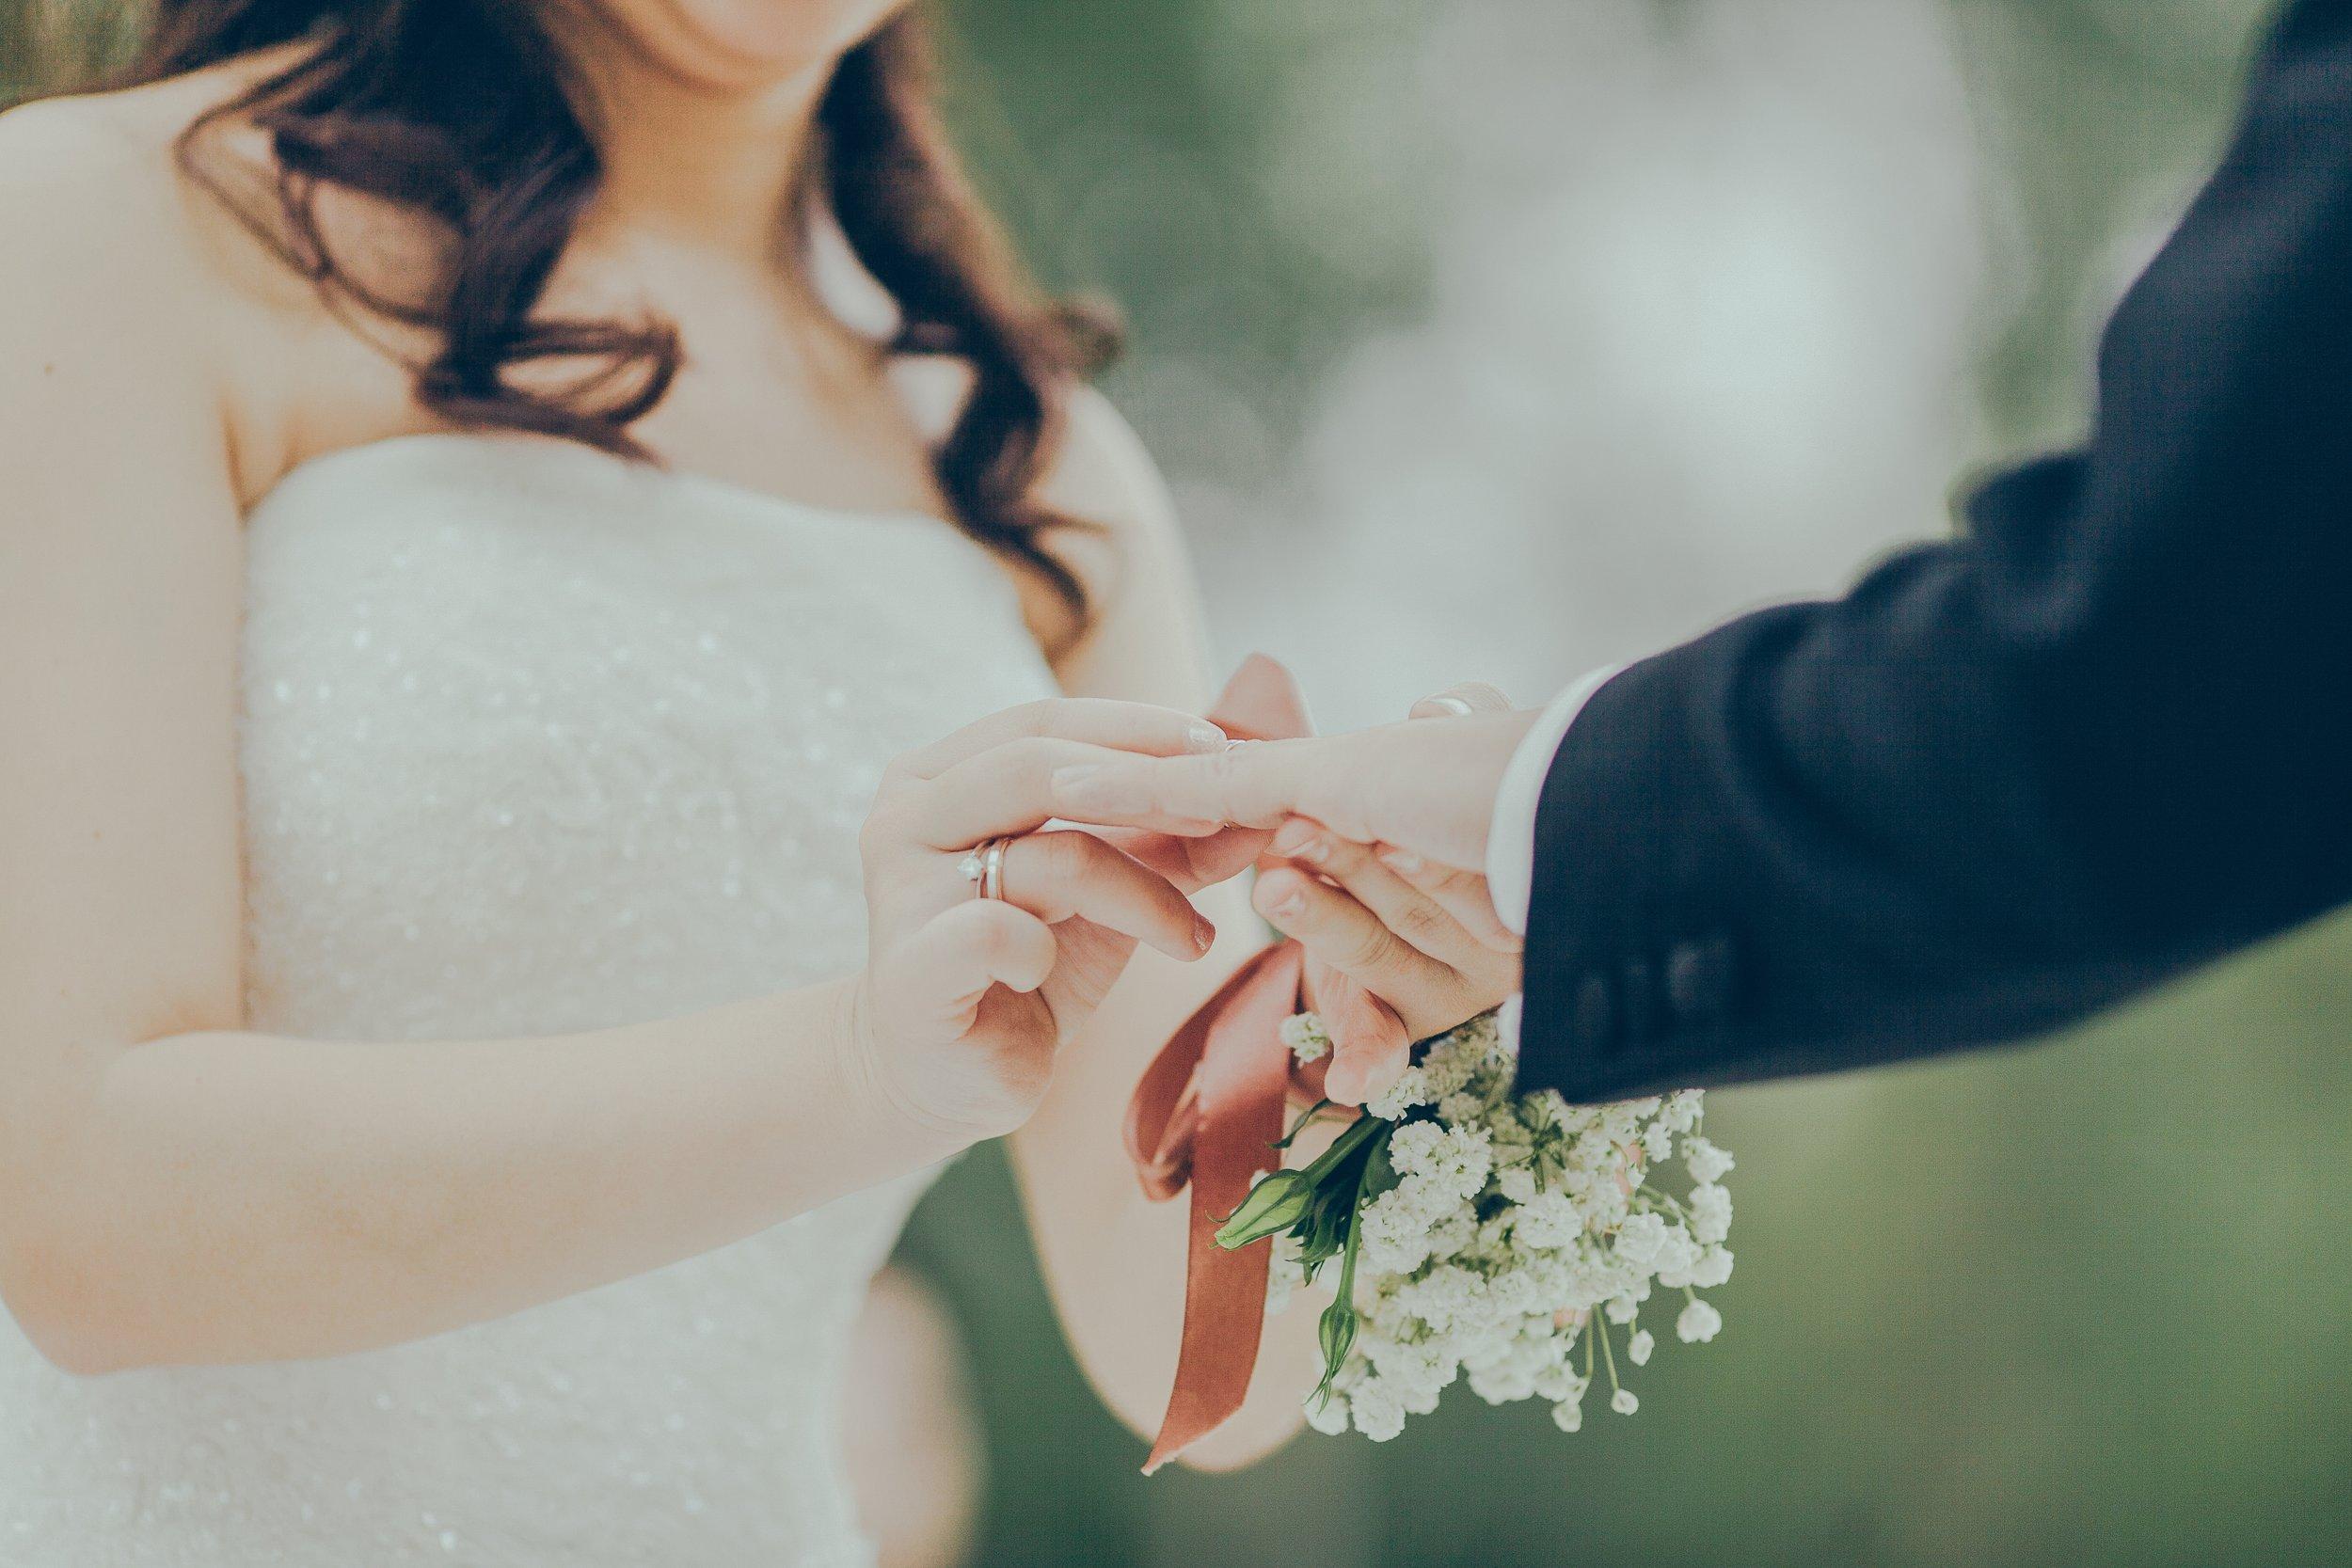 jeremy-wong-weddings-602196-unsplash.jpg